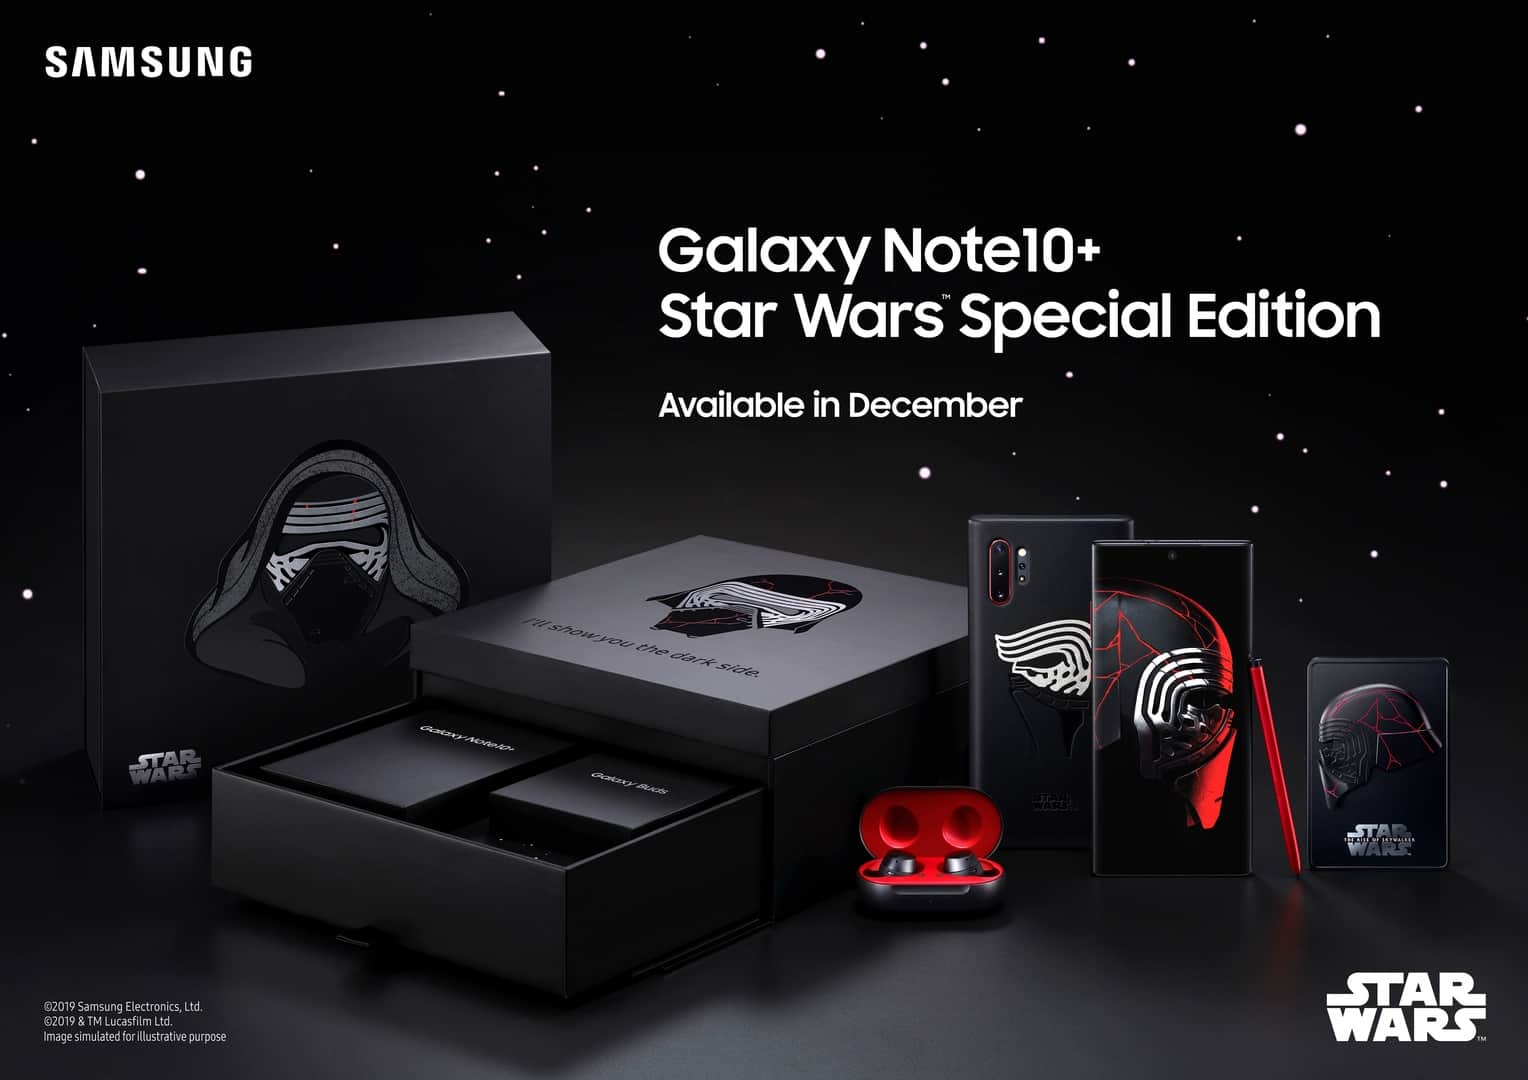 Samsung Galaxy Note 10 Plus Star Wars Special Edition image 4